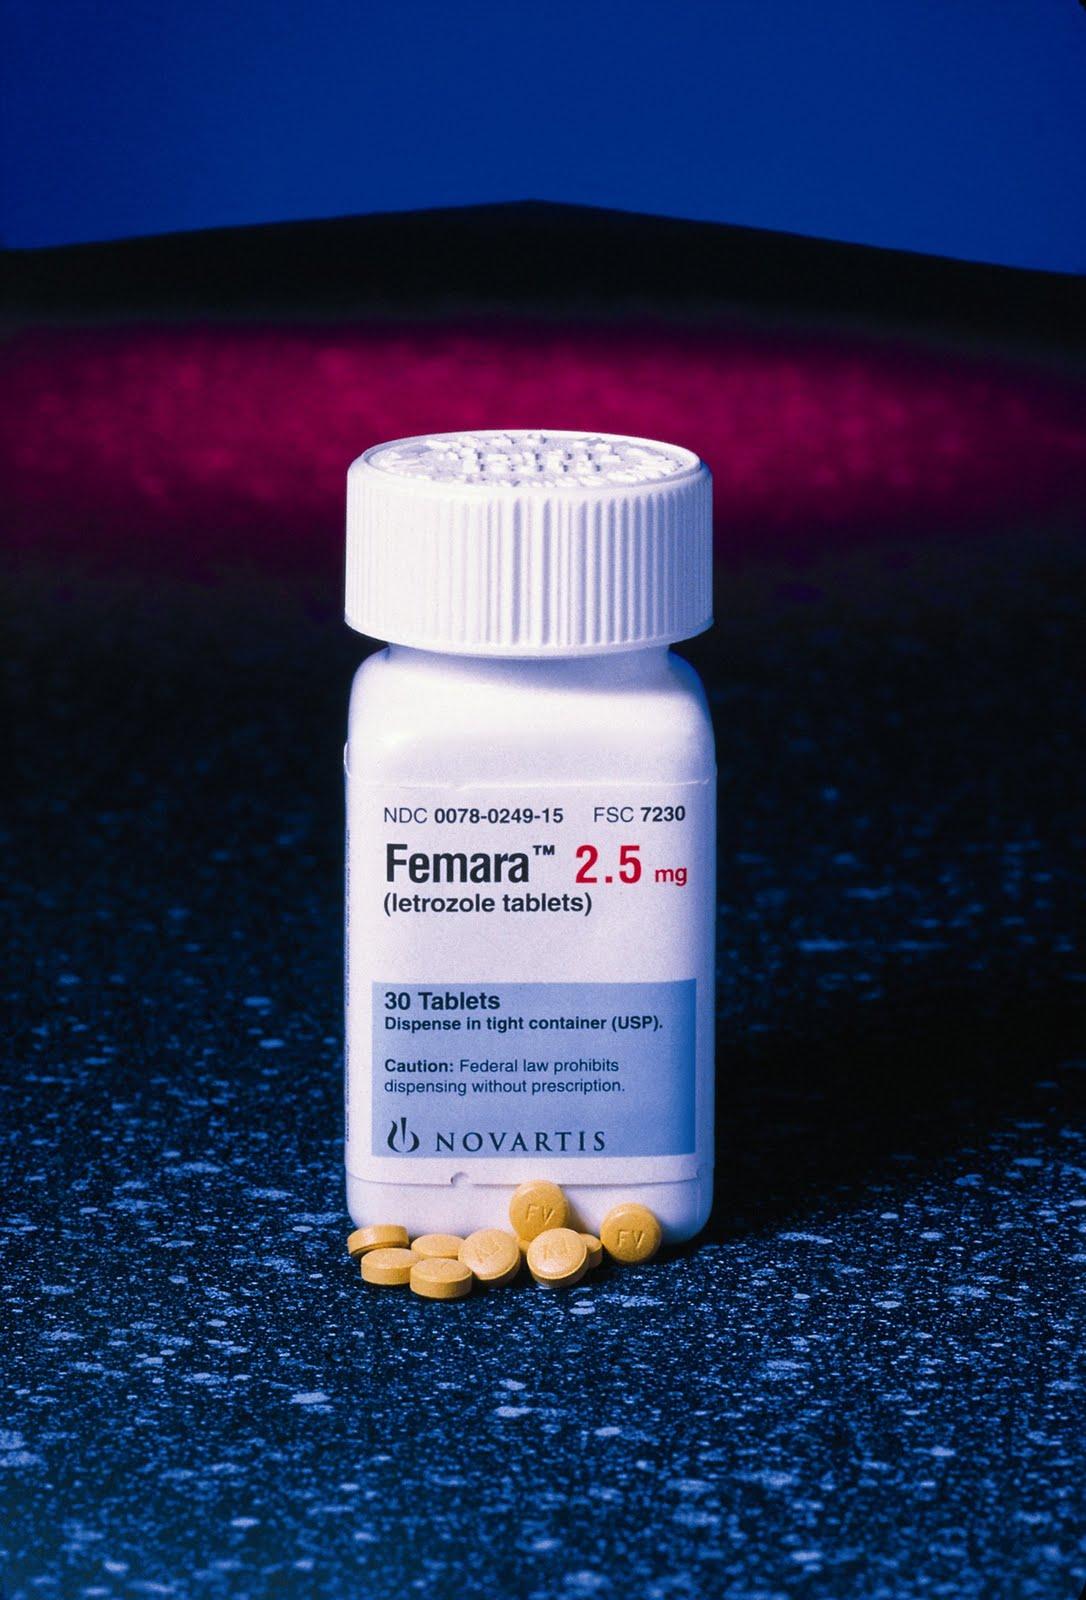 dose of valcivir in chickenpox